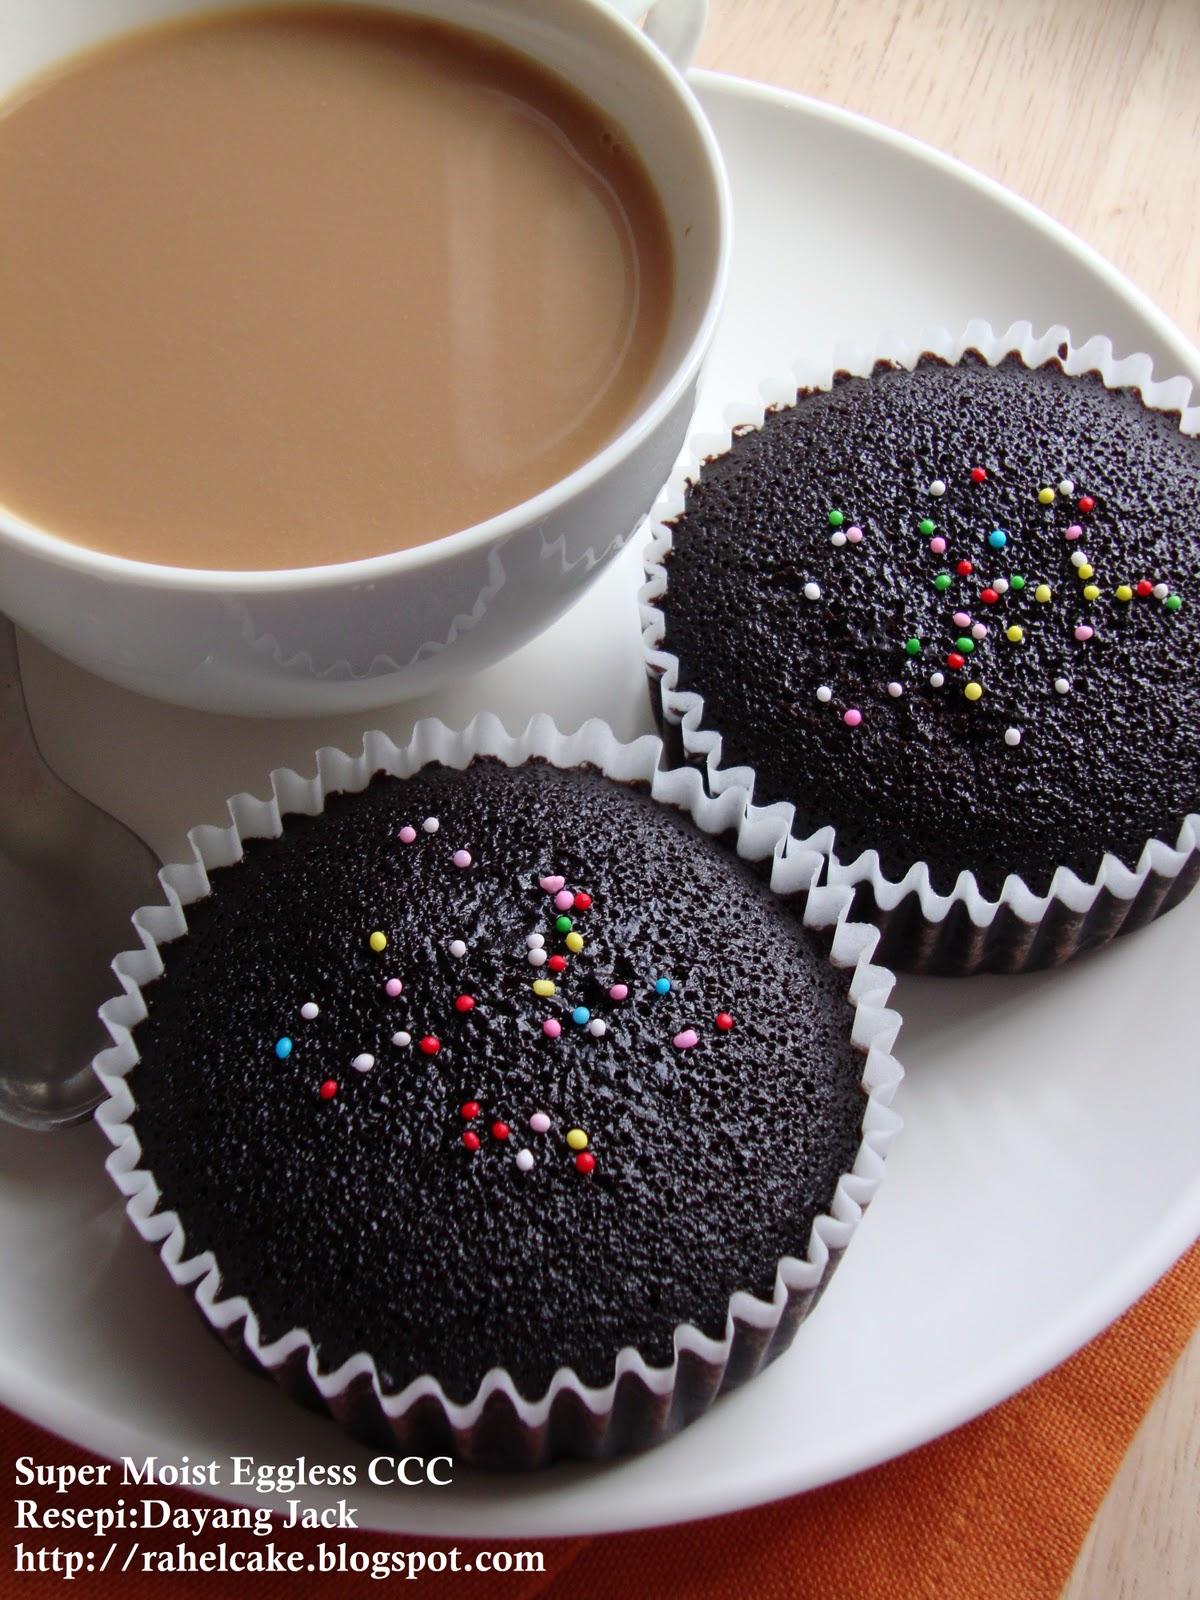 resepi kek coklat yg mudah  sedap  quotes Resepi Kek Lapis Cheese Tanpa Bakar Enak dan Mudah